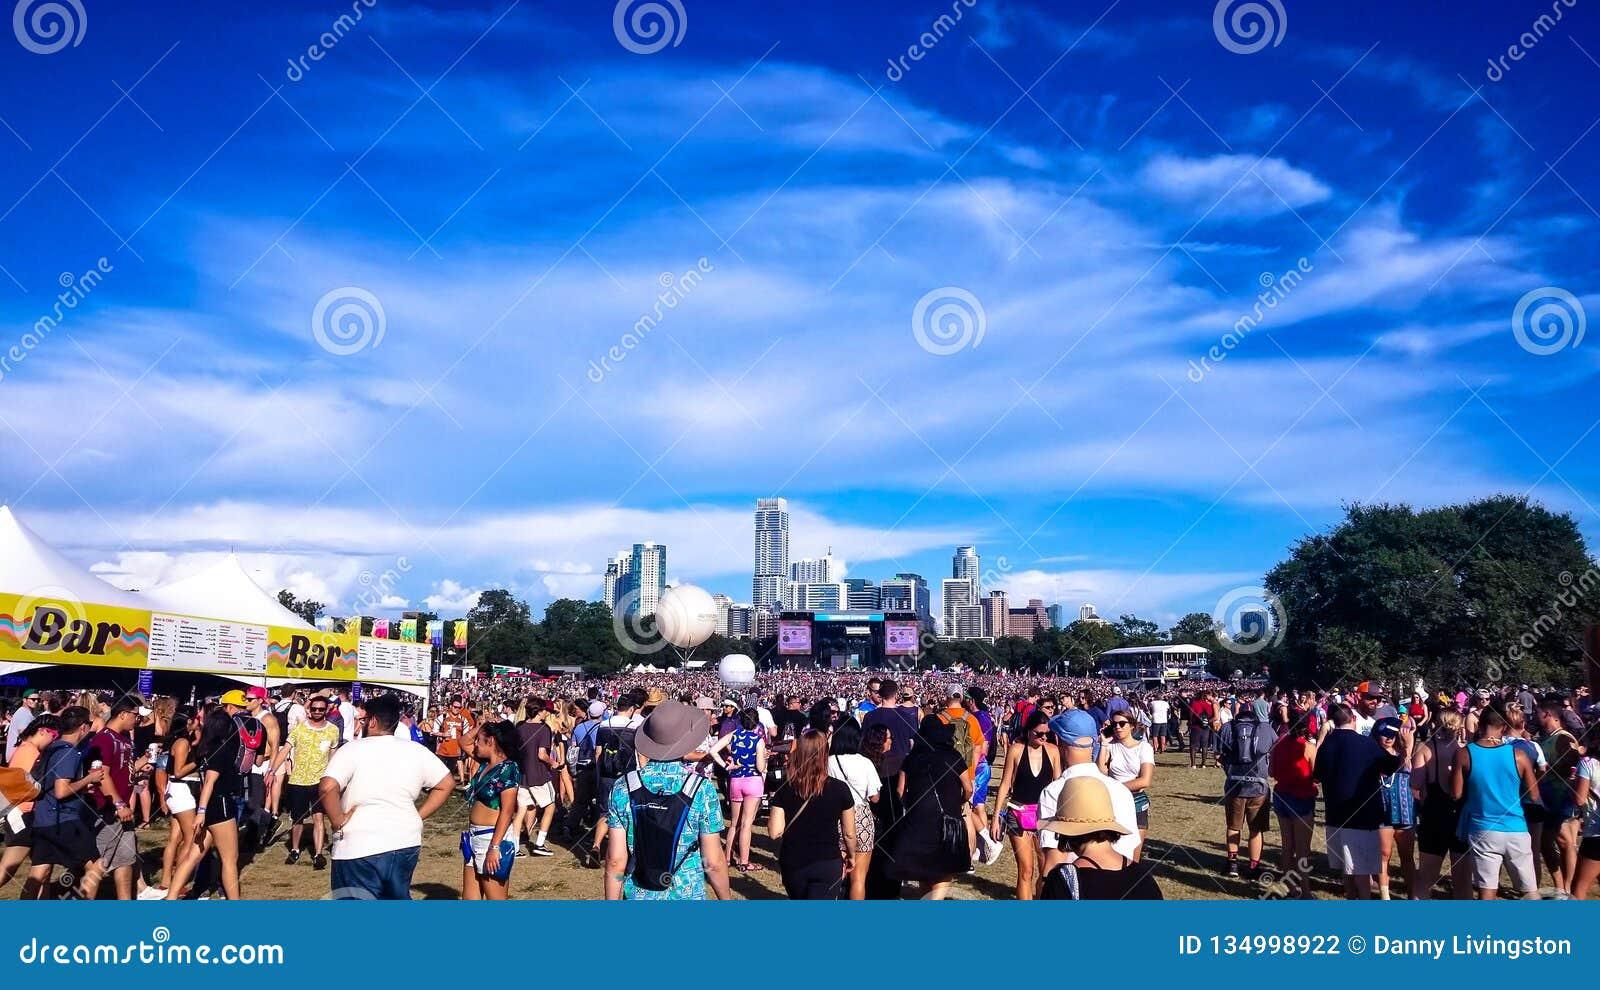 Wide Crowd Image at Austin City Limits Music Festival